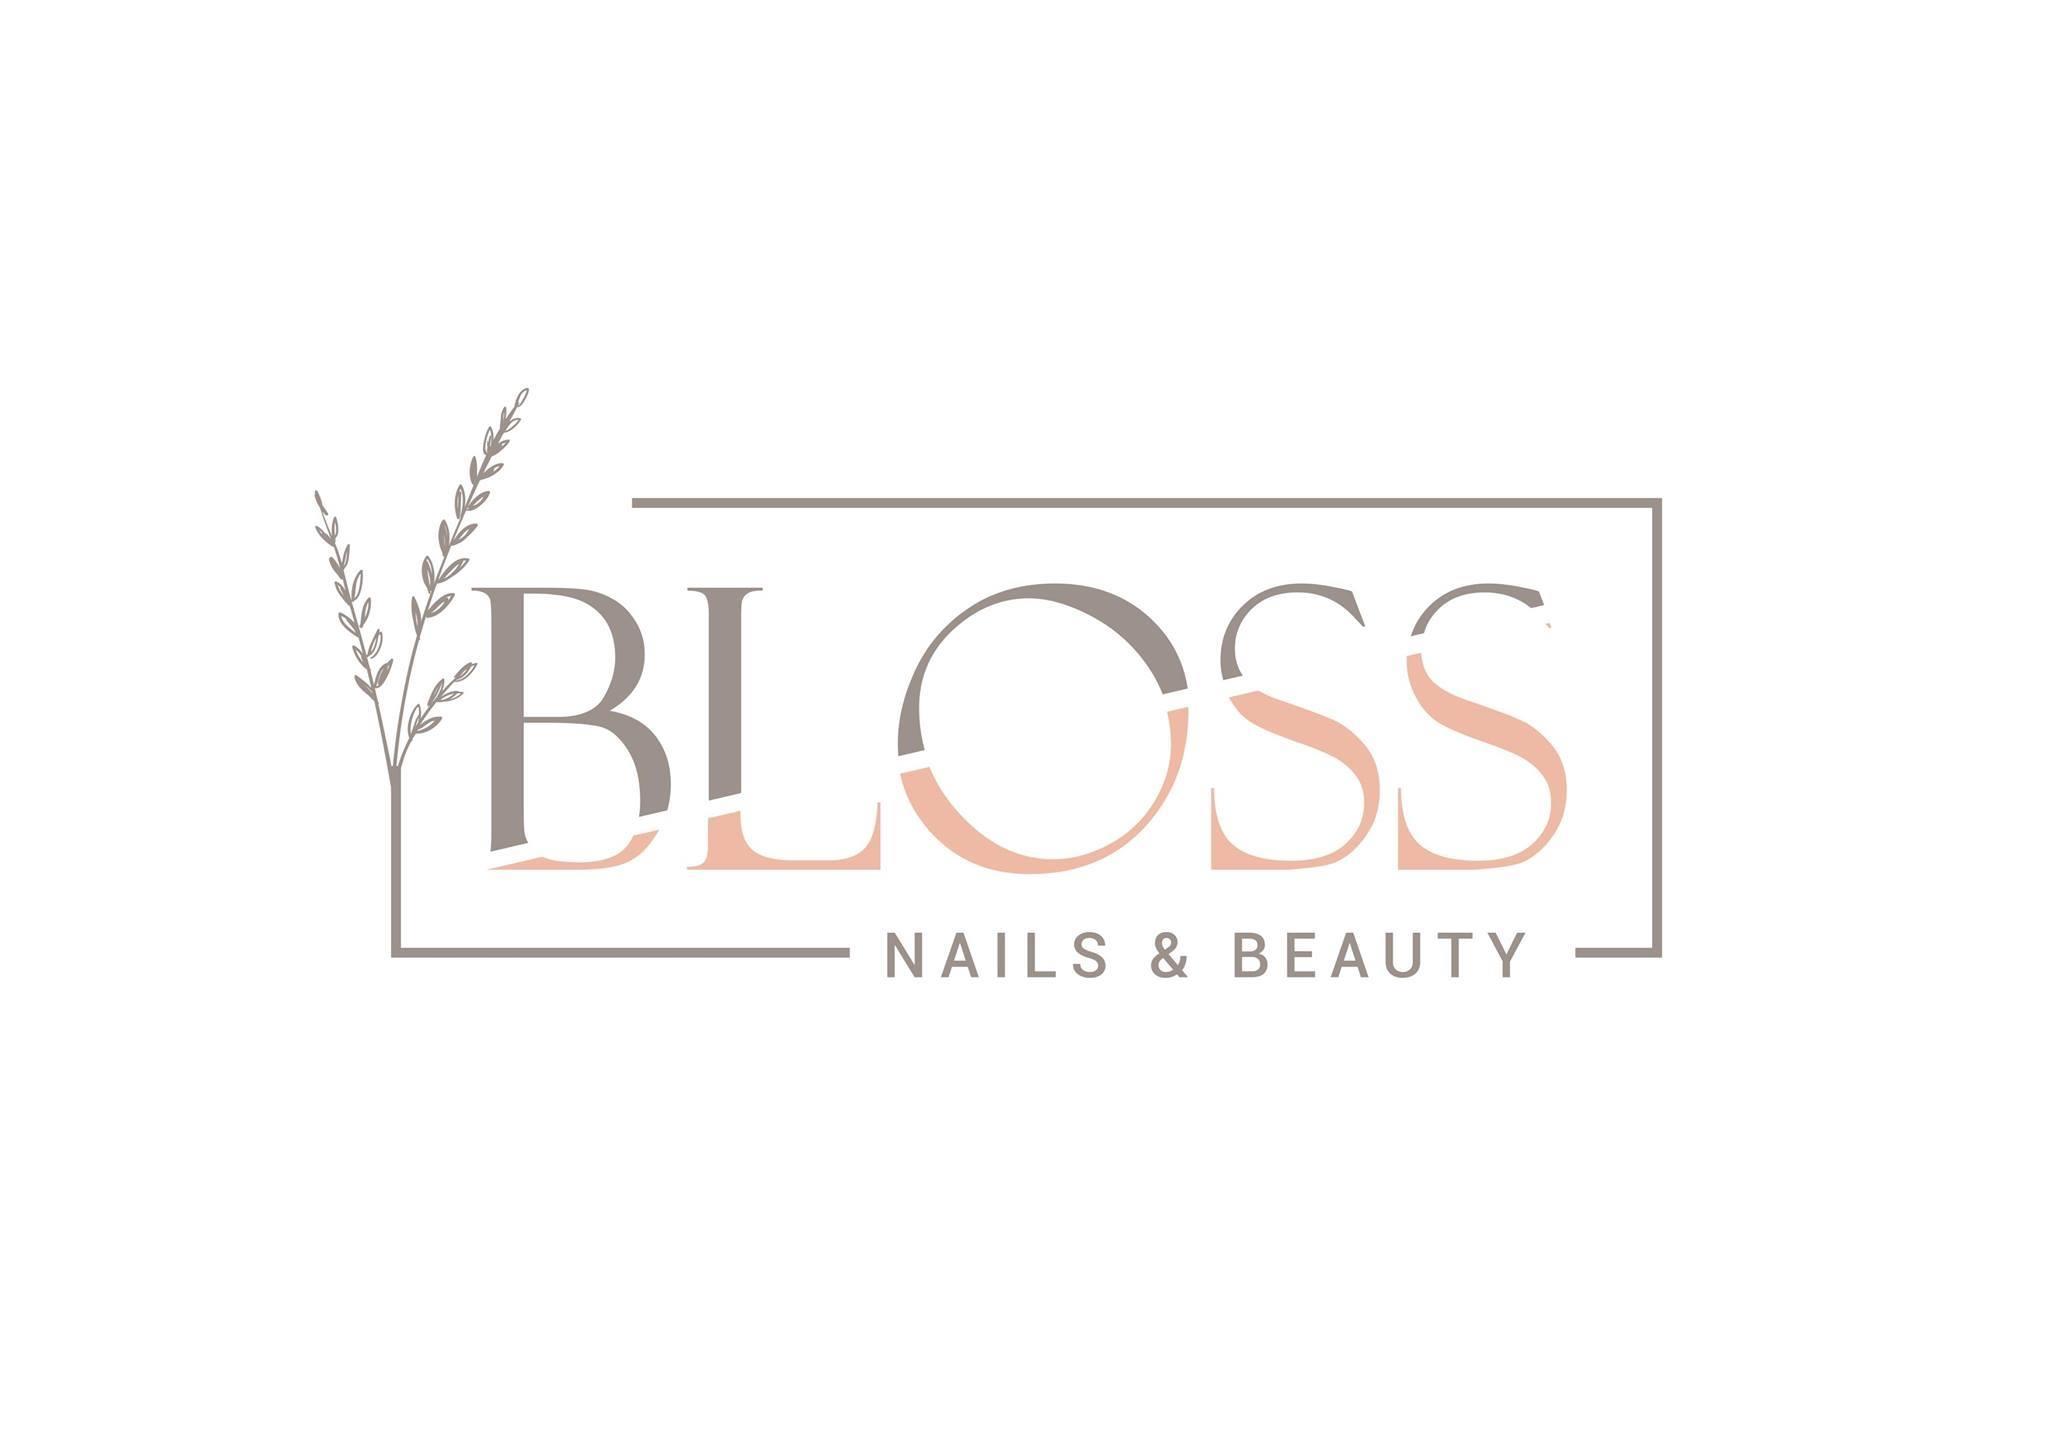 BLOSS NAILS & BEAUTY